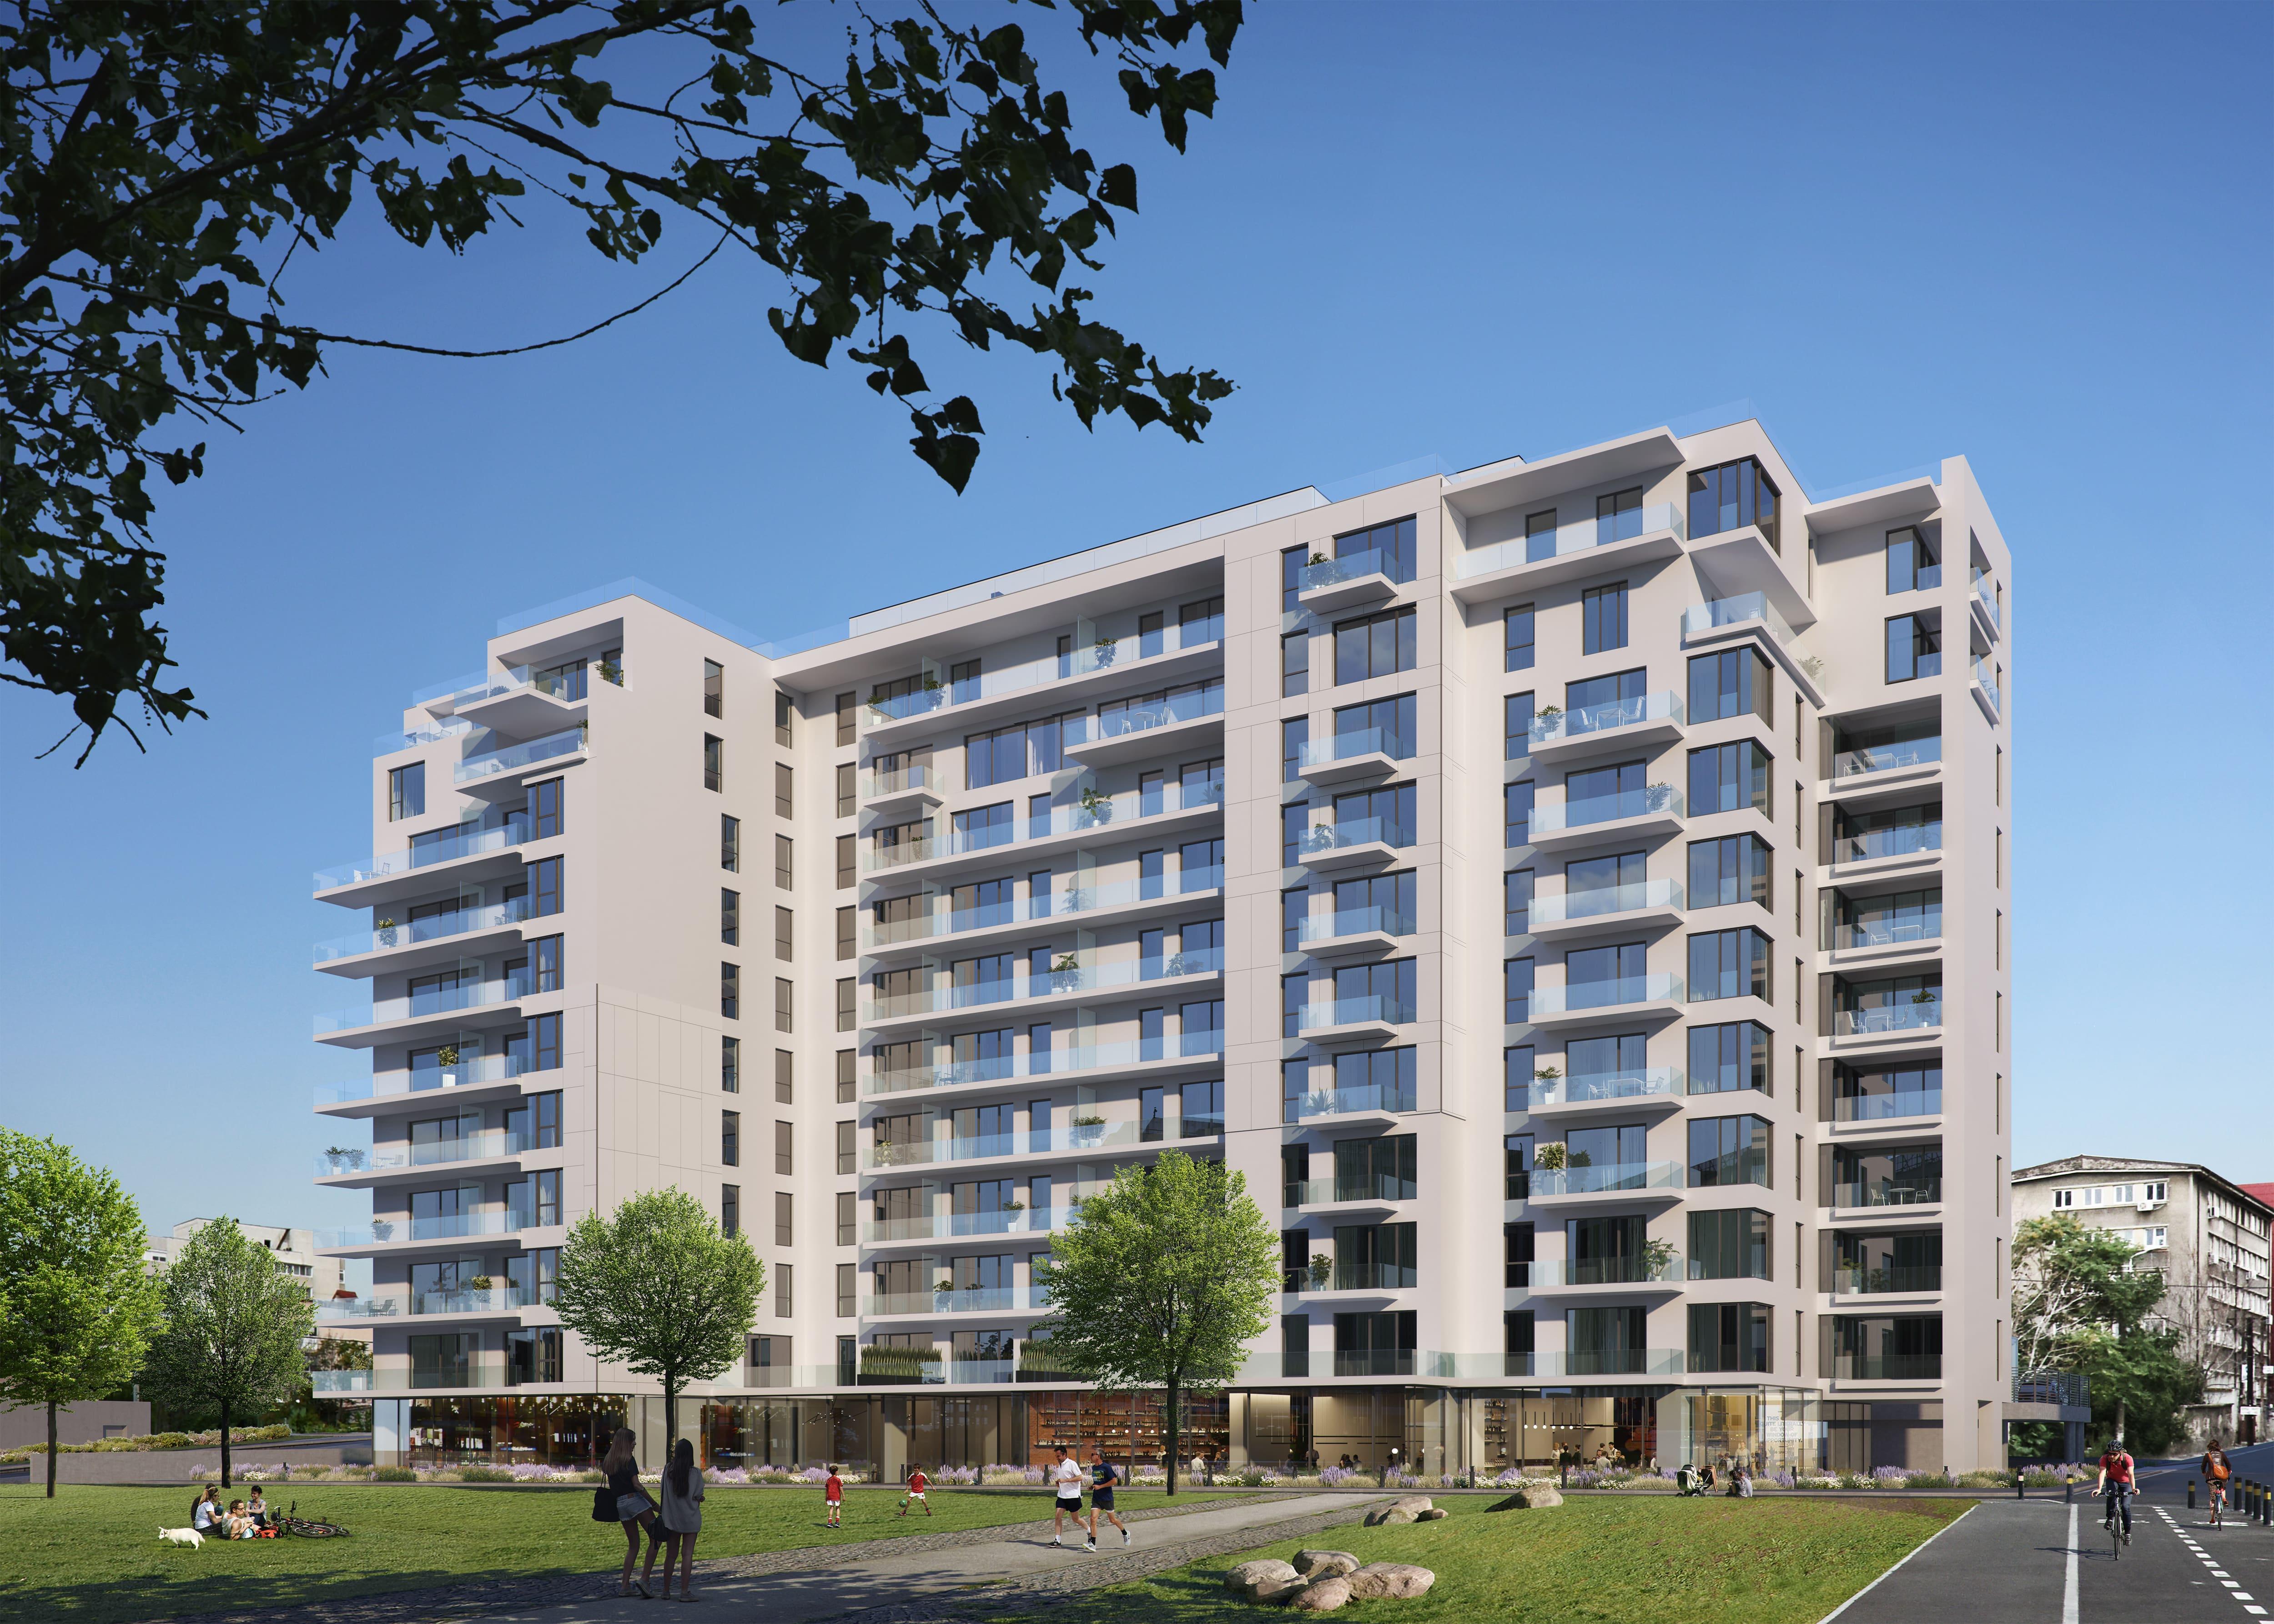 https://ahe-ro.s3.amazonaws.com/8240/penthouse-si-apartamente-unirii-%287%29.jpg